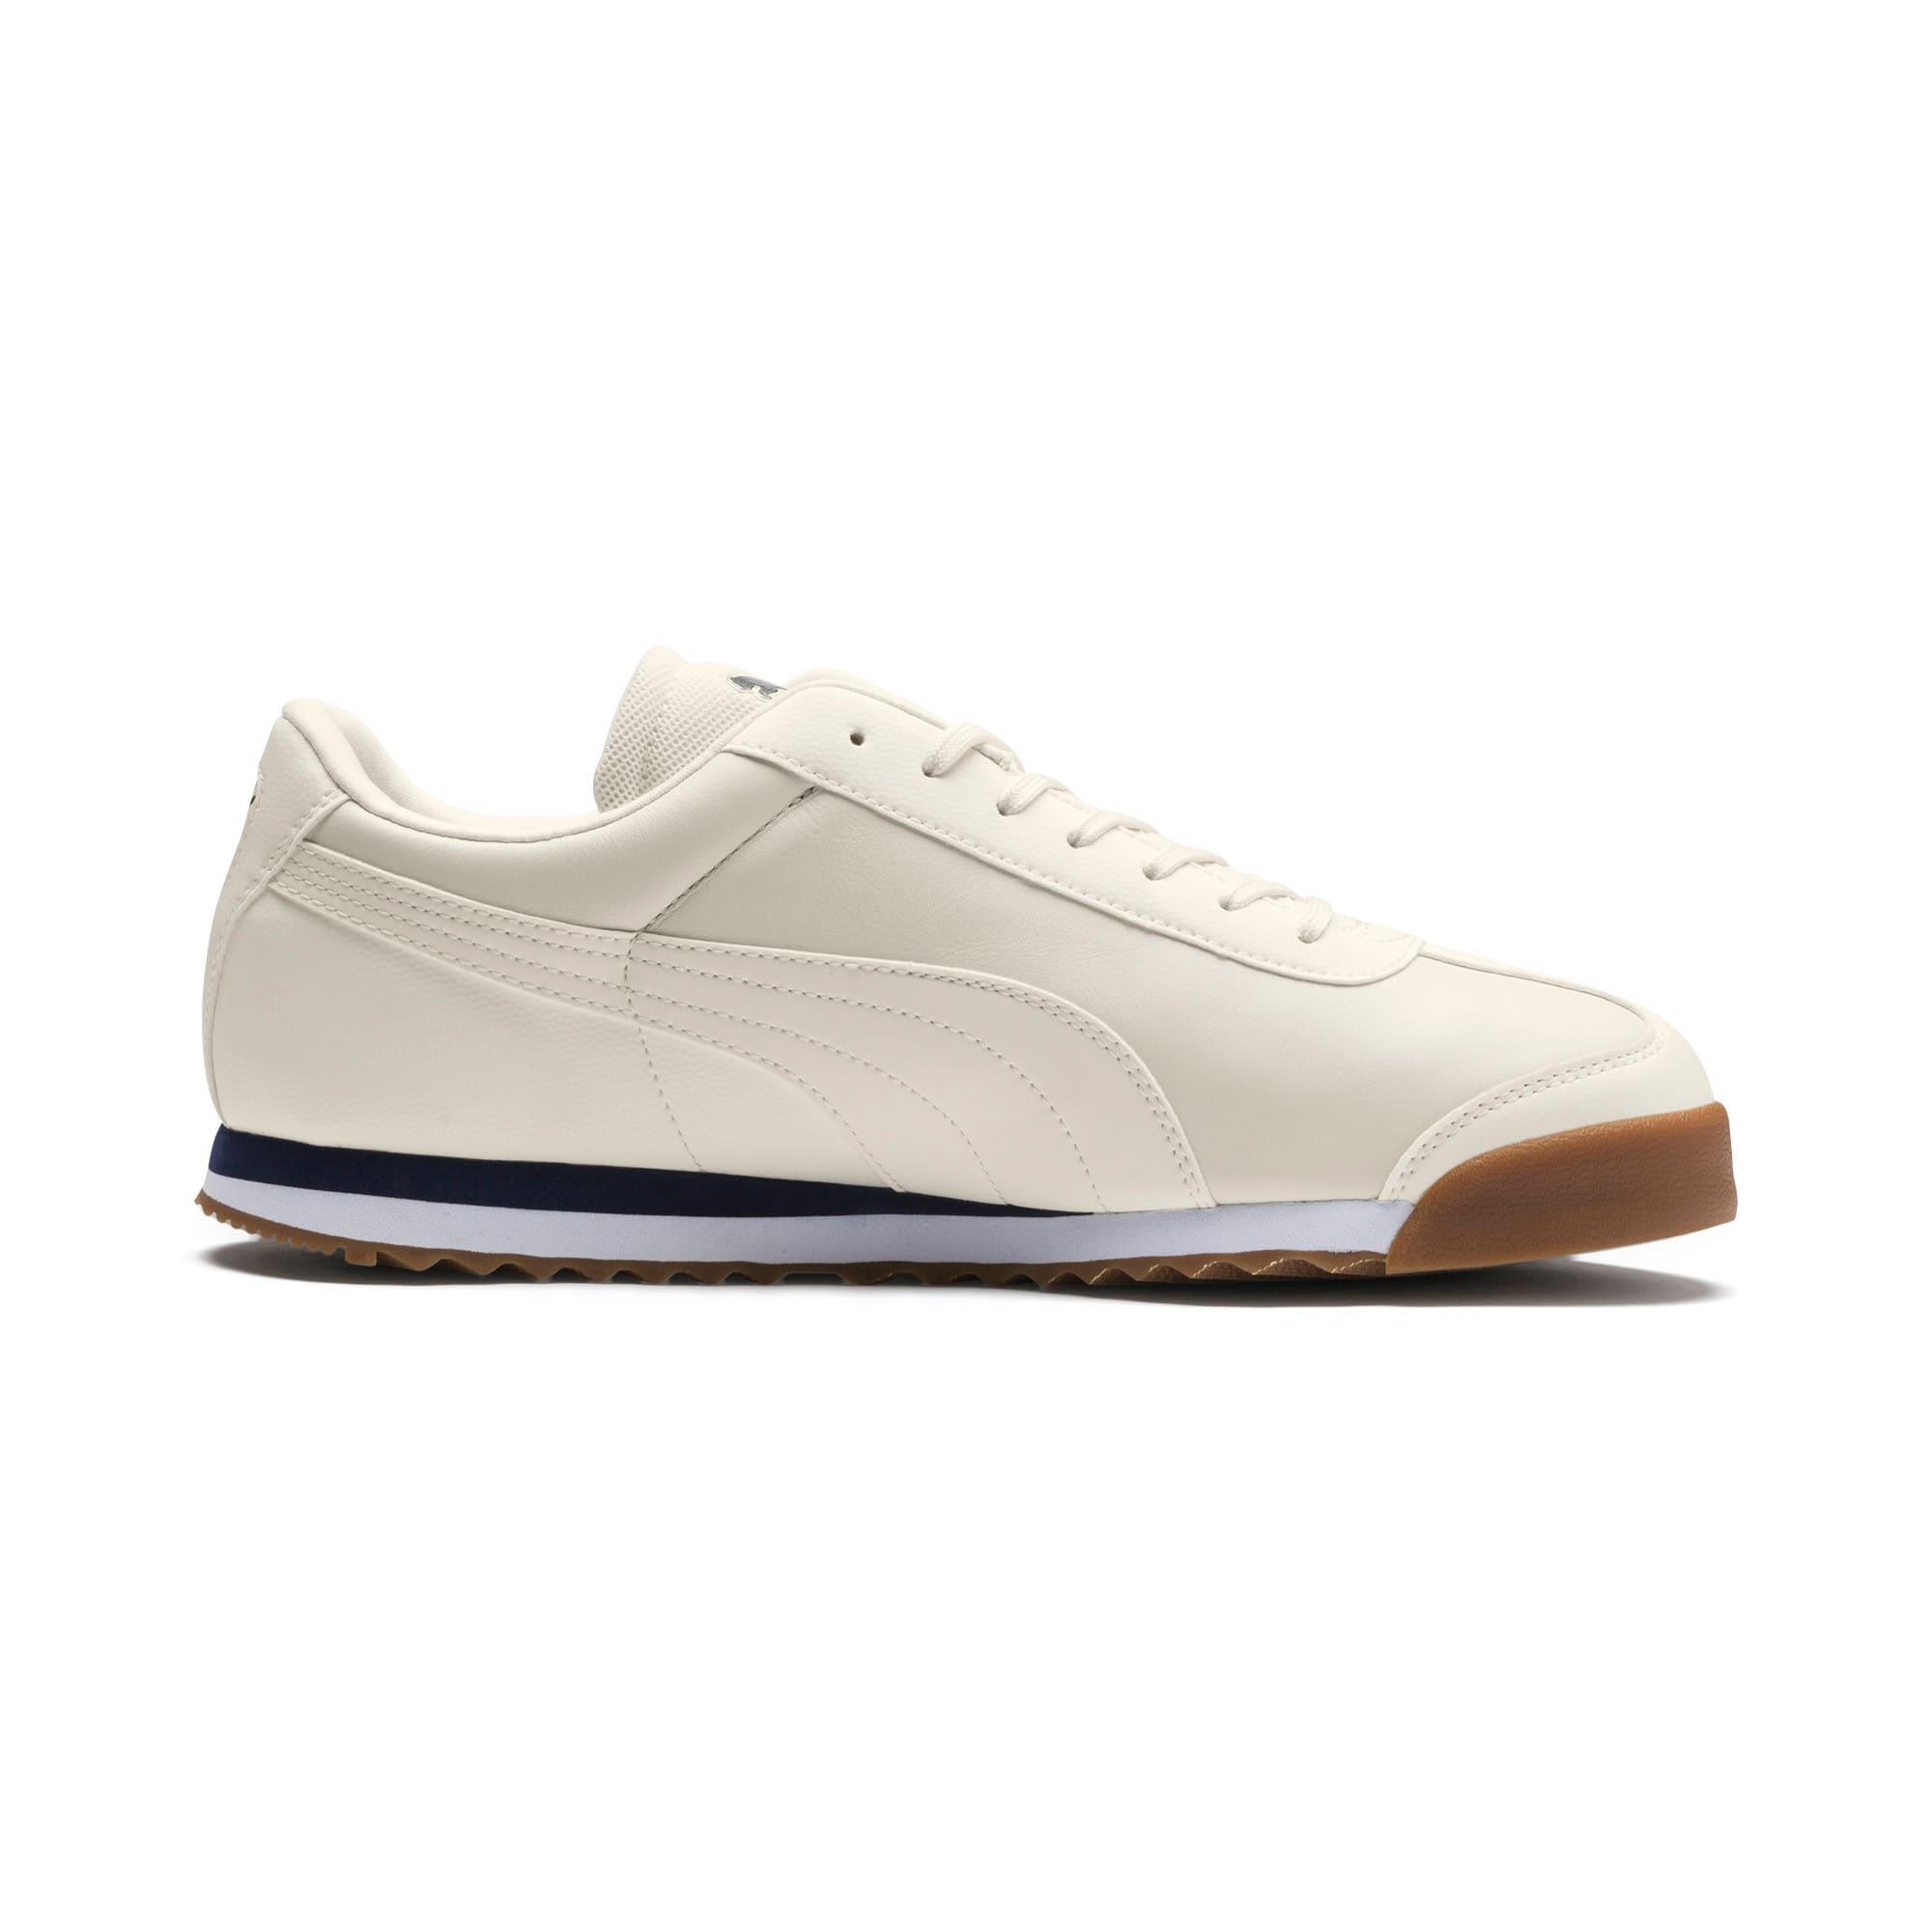 Thumbnail 5 of Scuderia Ferrari Roma Men's Sneakers, Whisper White-Whisper White, medium